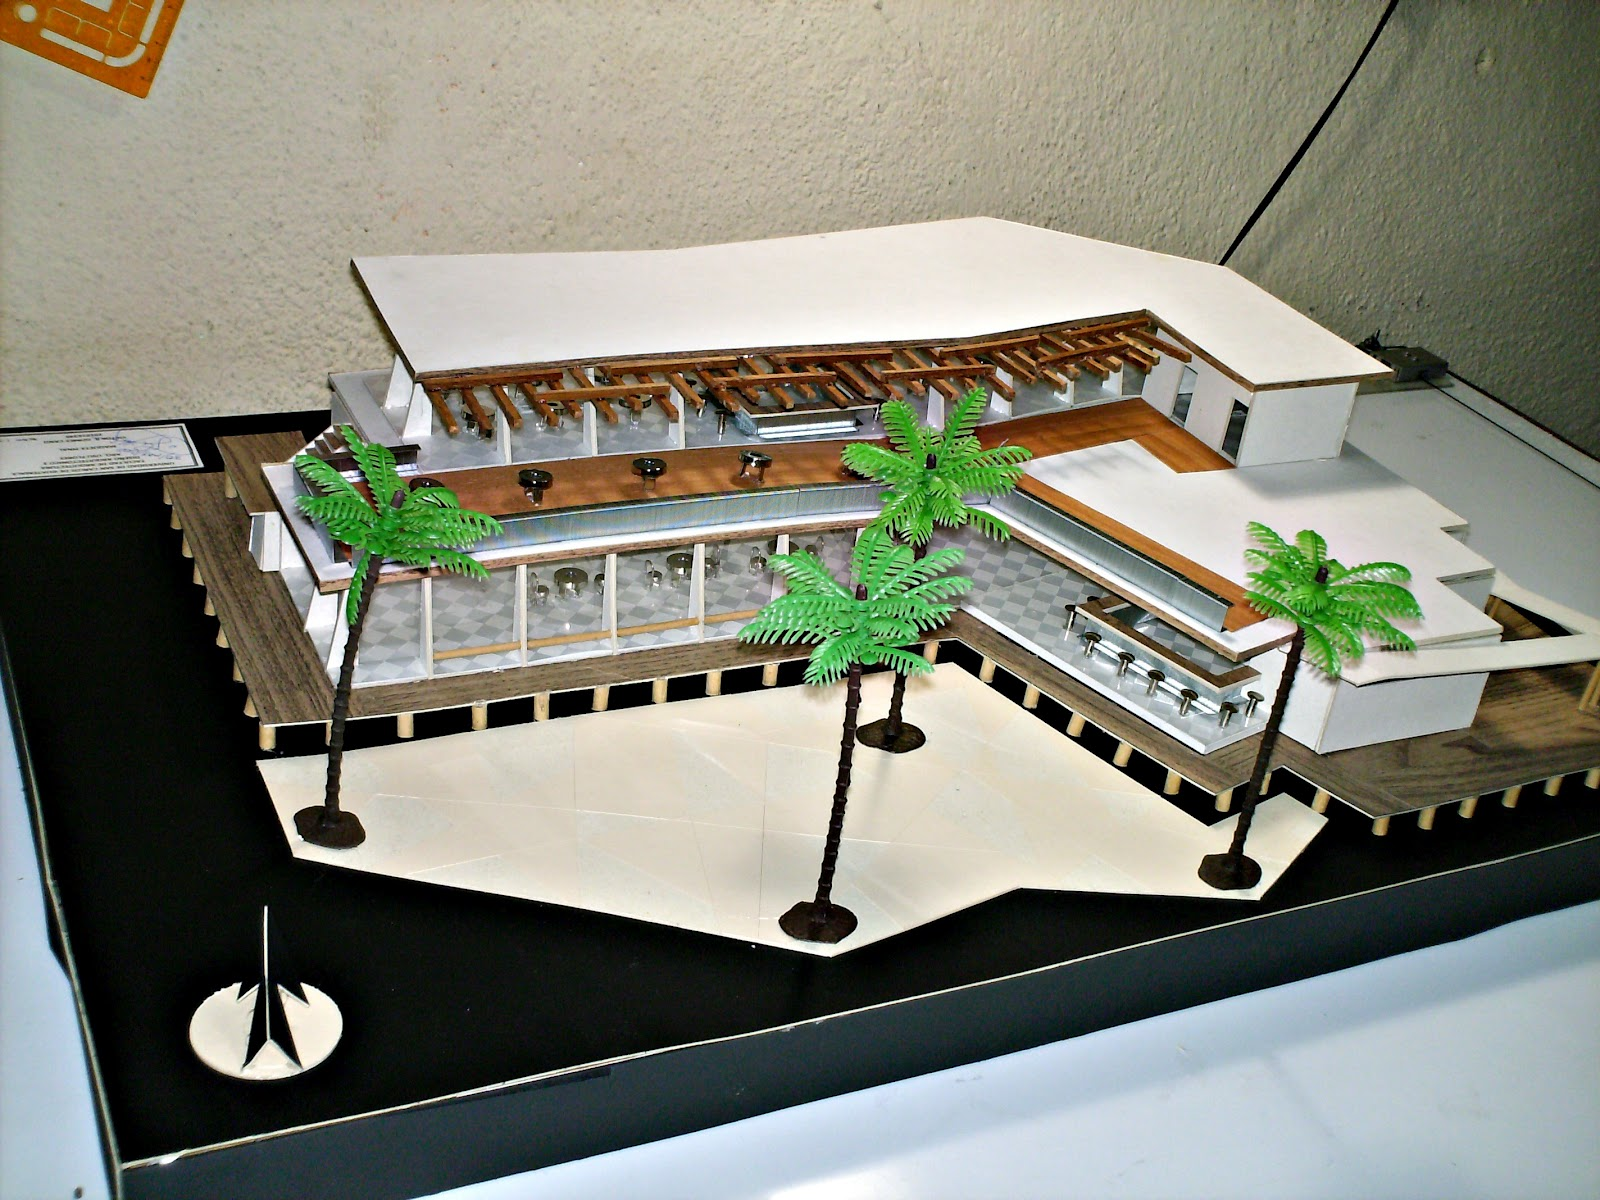 Portafolio dise o arquitect nico dise o arquitectonico 2 - Restaurantes de diseno ...